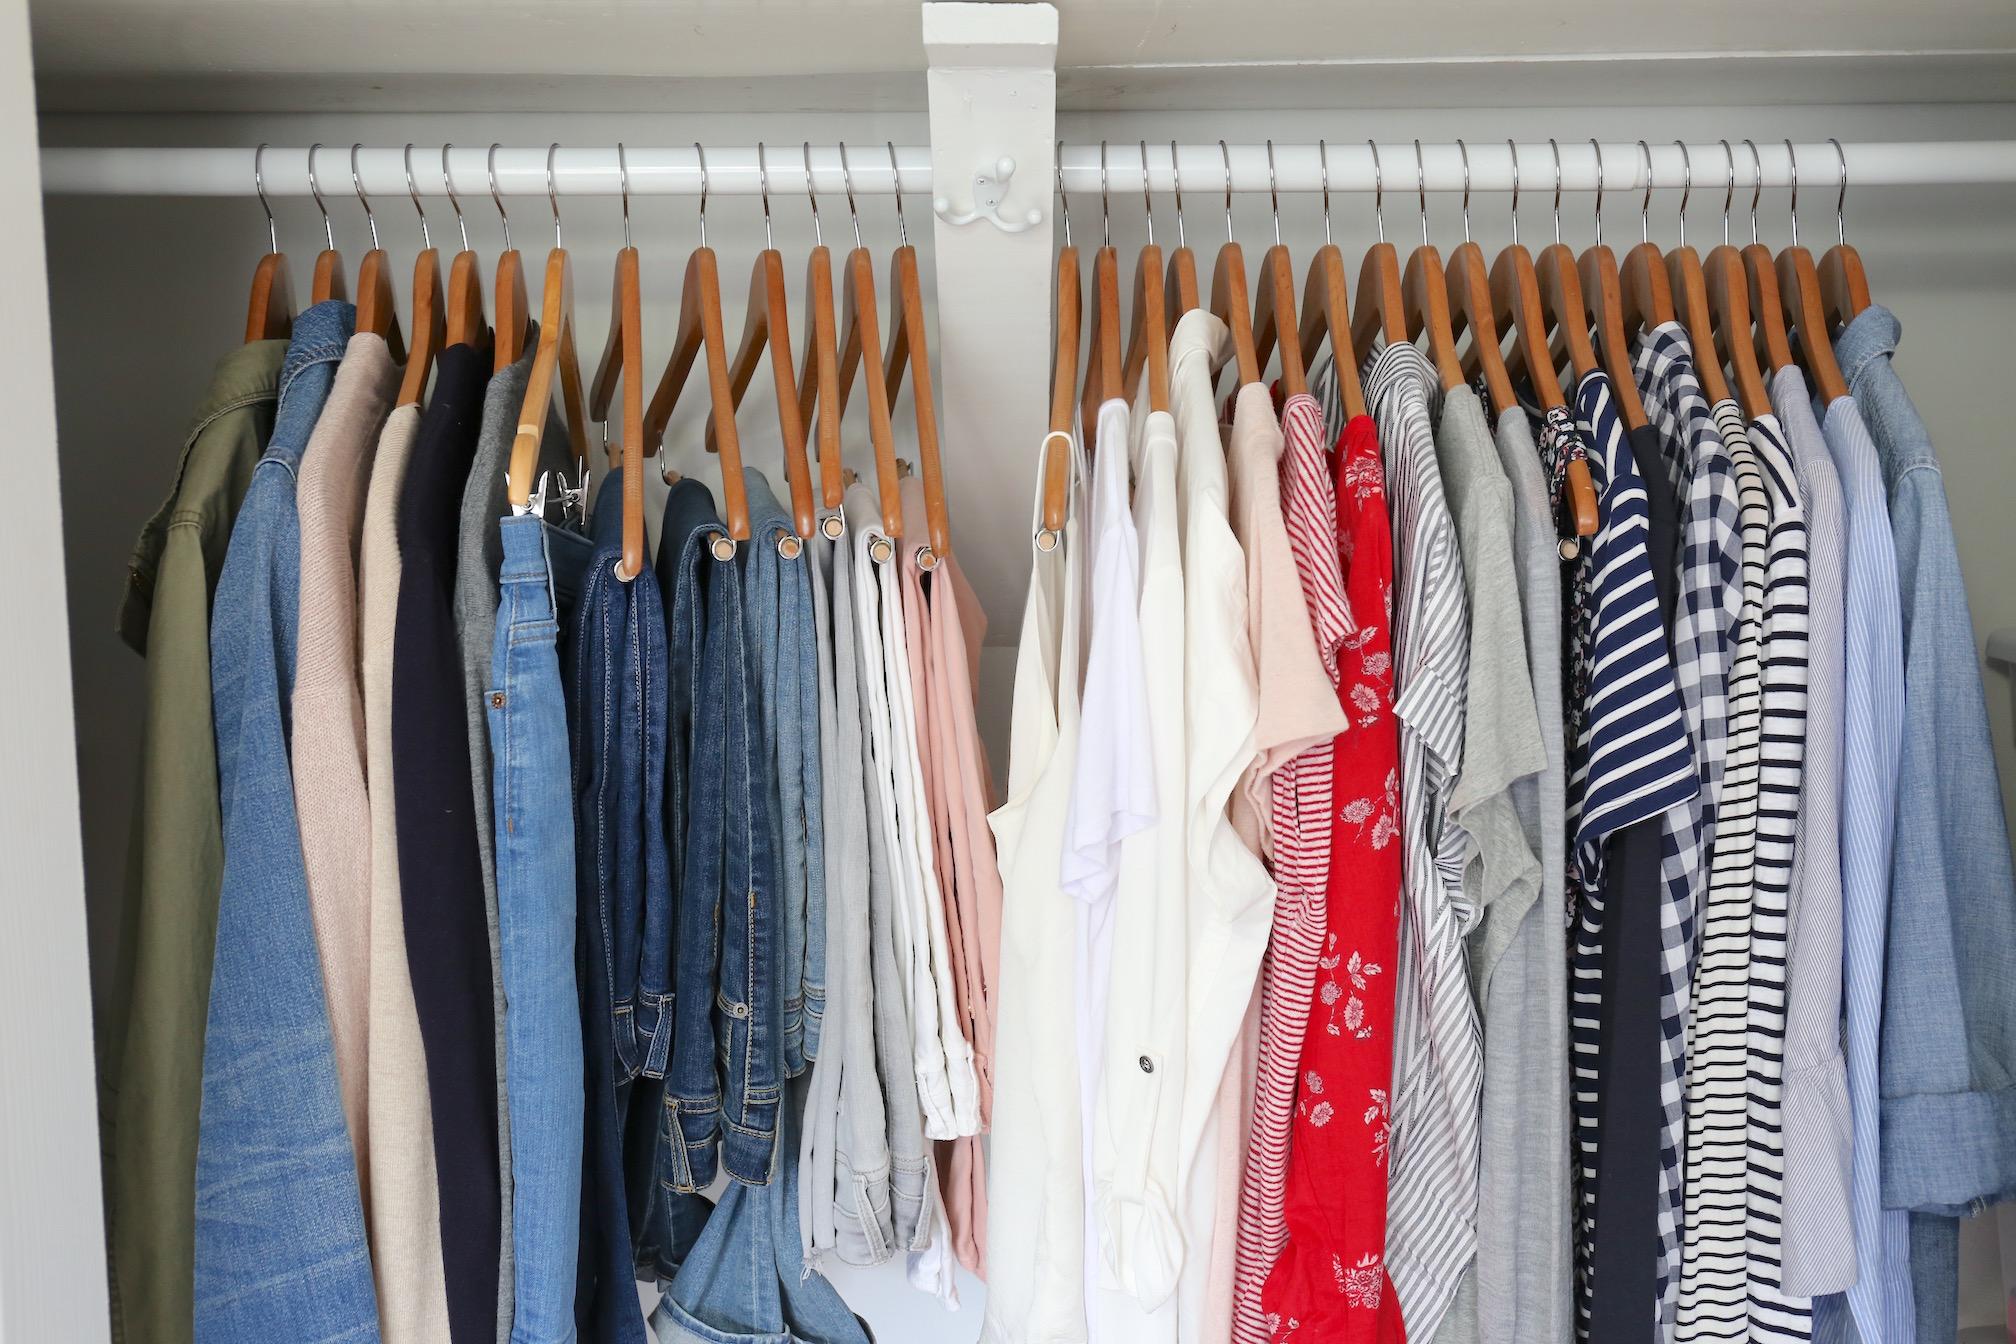 My Spring 2018 Capsule Wardrobe - closet closeup full